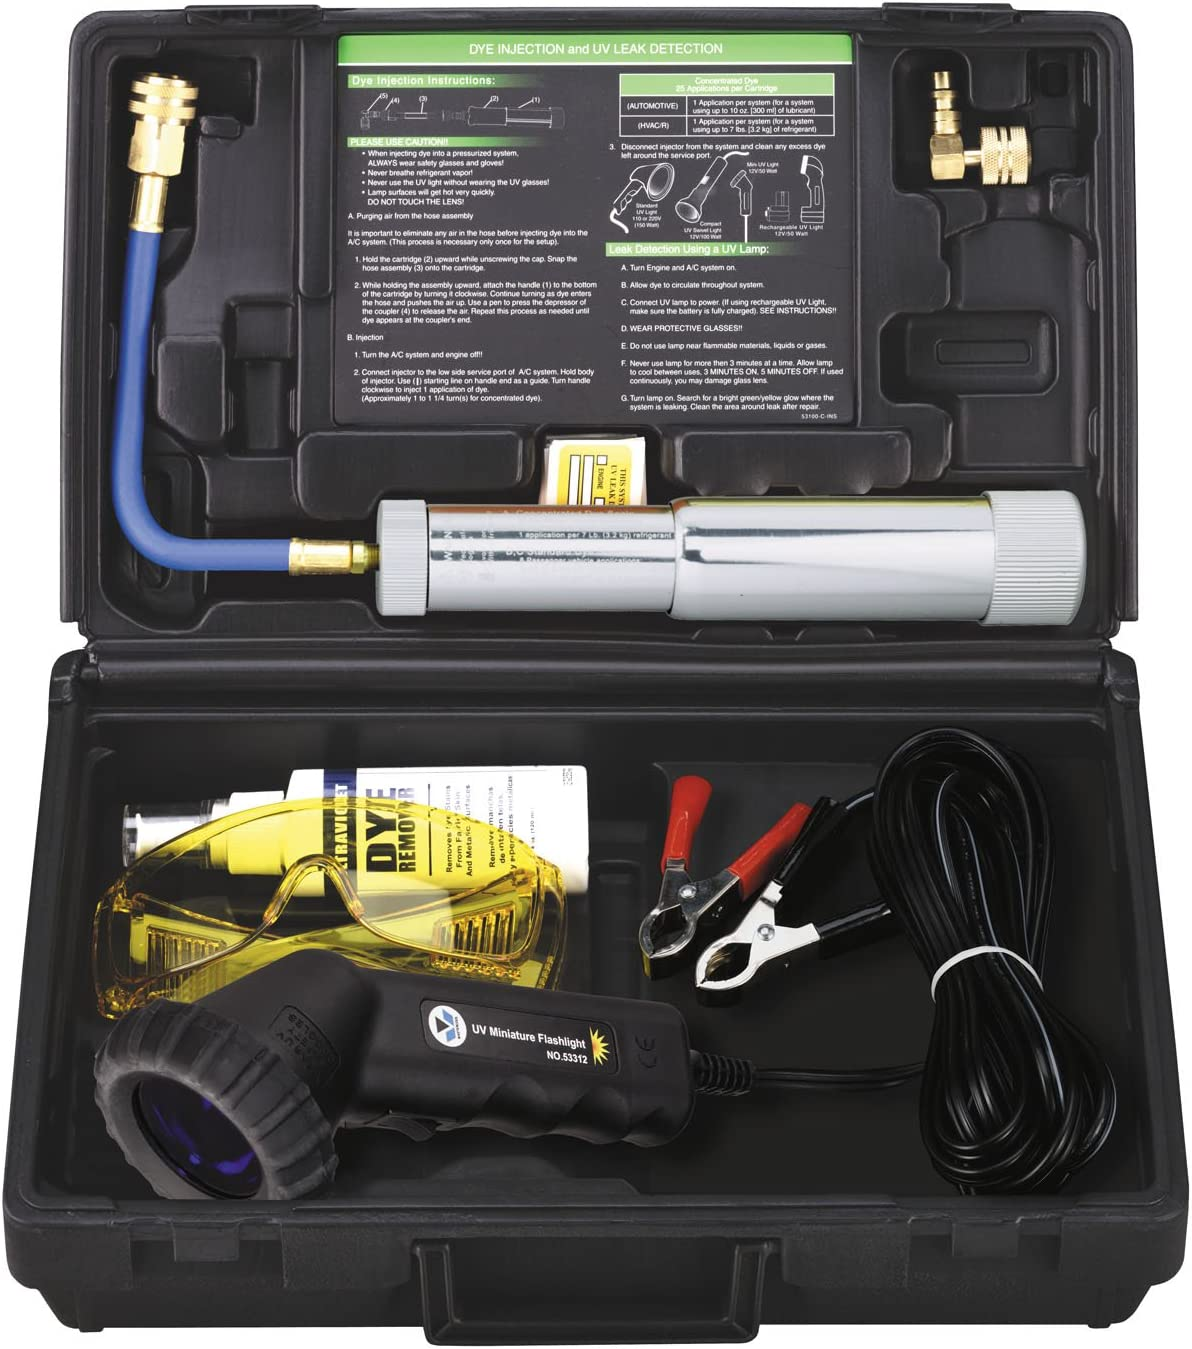 Mastercool 53351 Professional Uv Leak Detection Kit